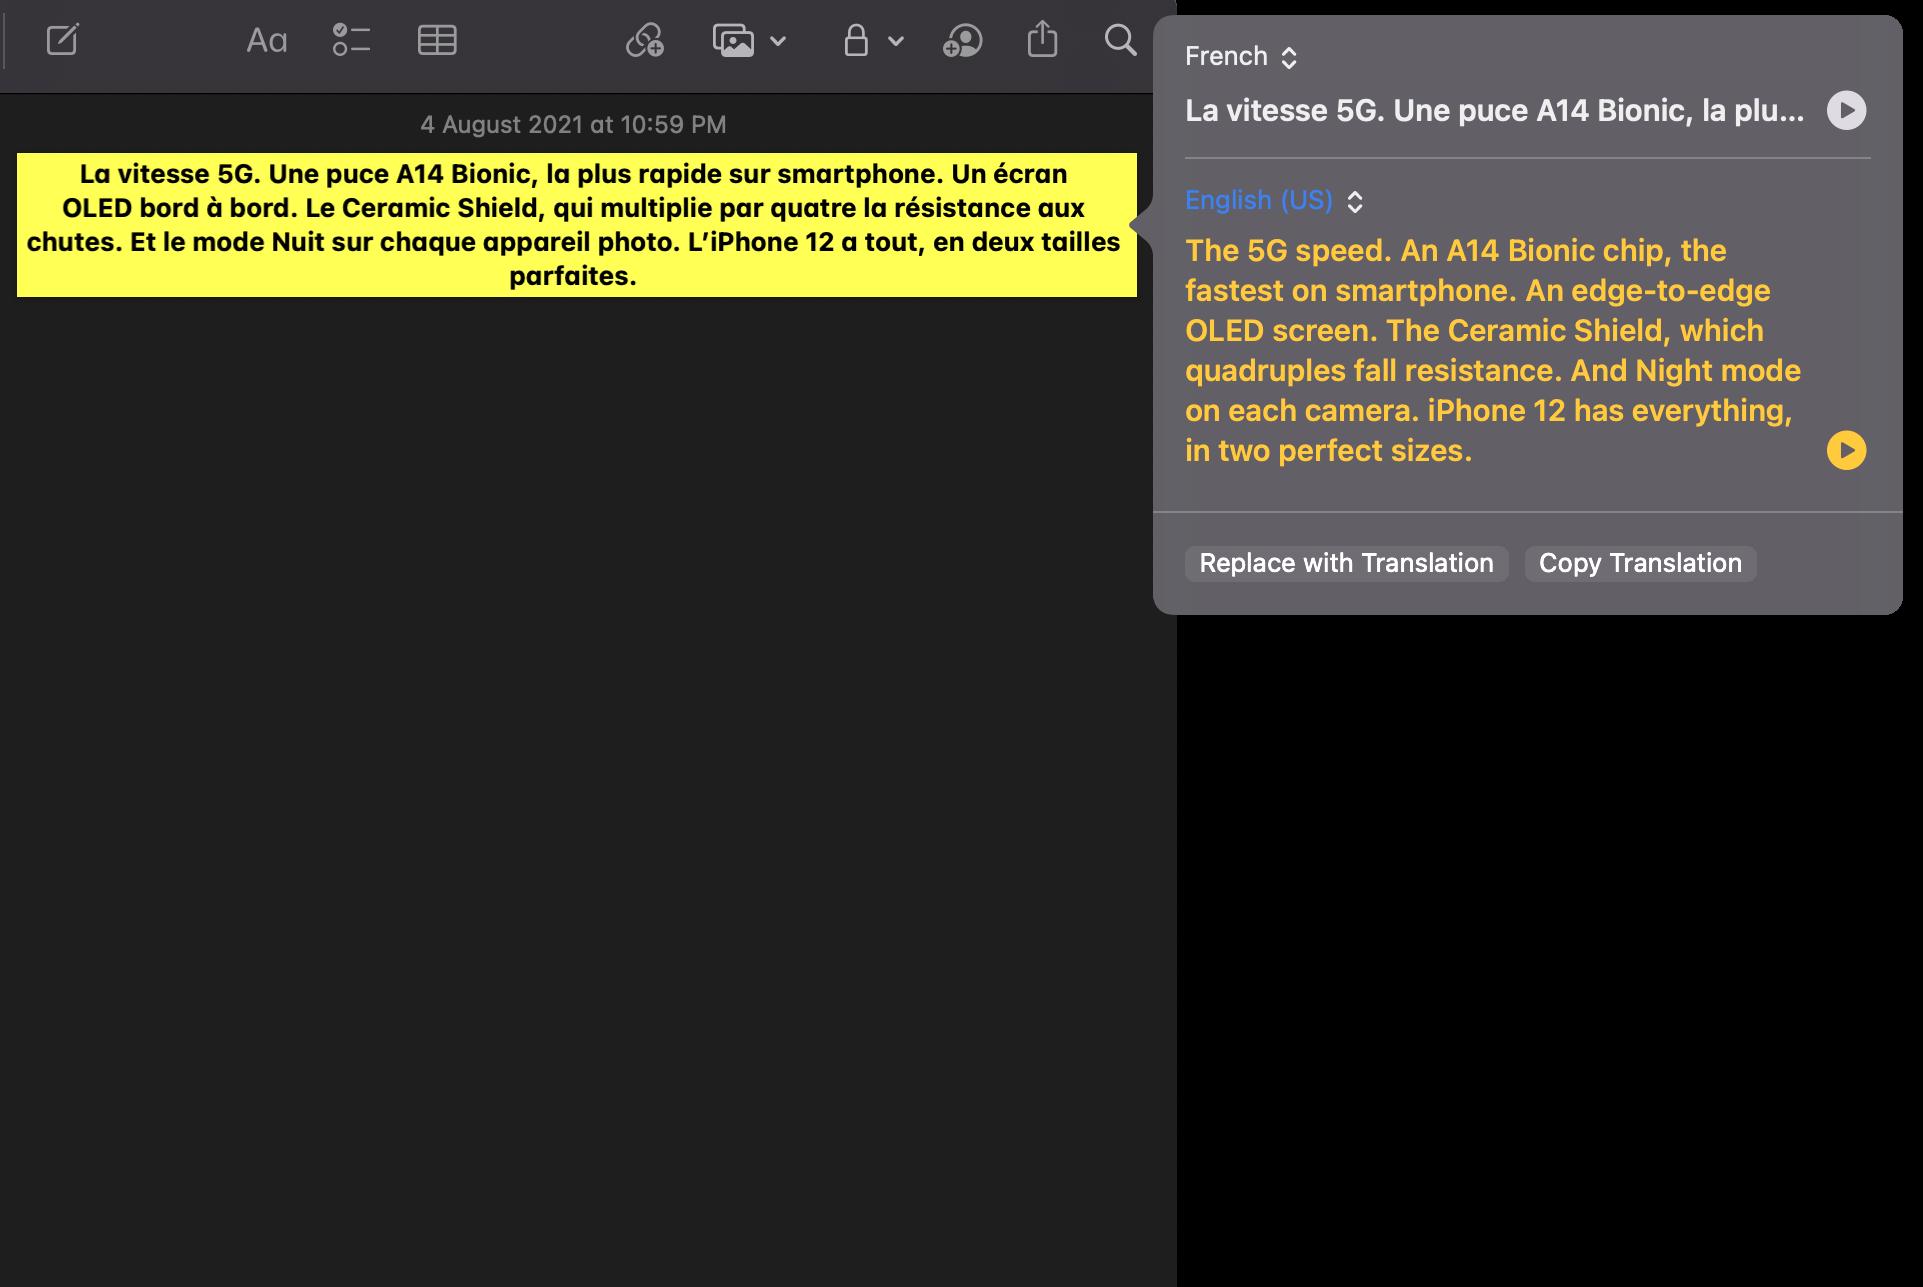 Paste translation macOS 12